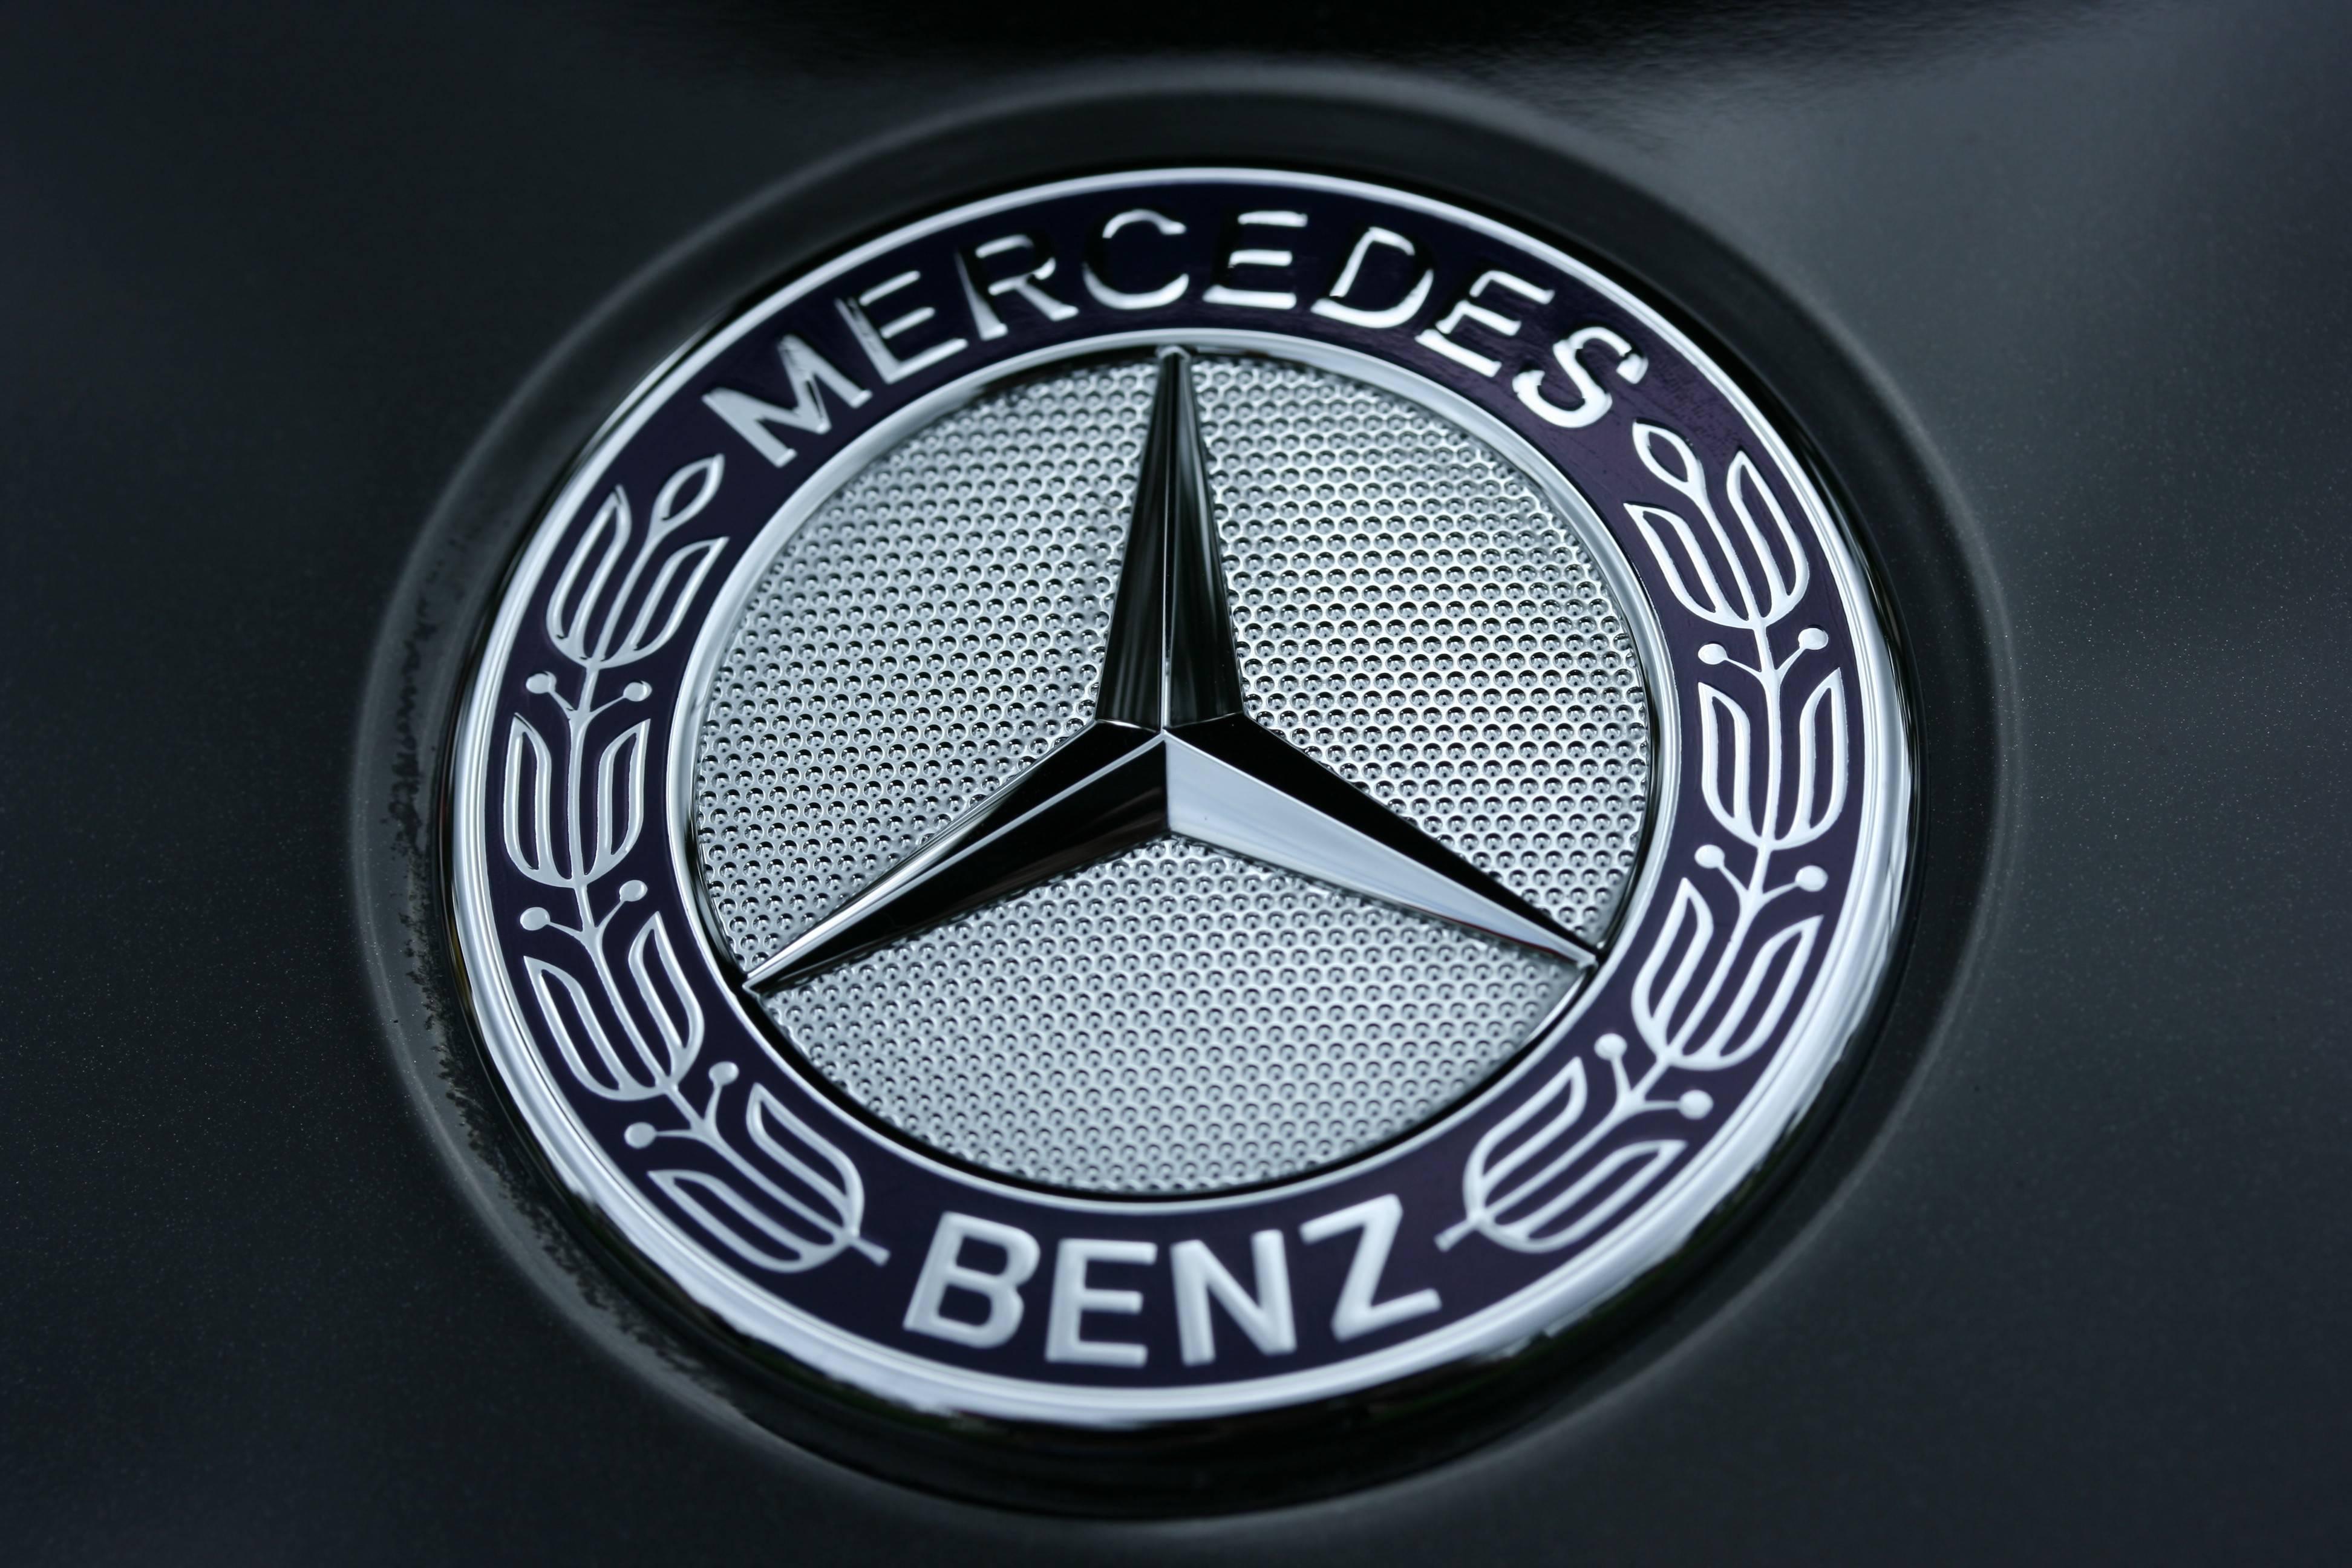 Car Logo Hd Wallpapers Top Free Car Logo Hd Backgrounds